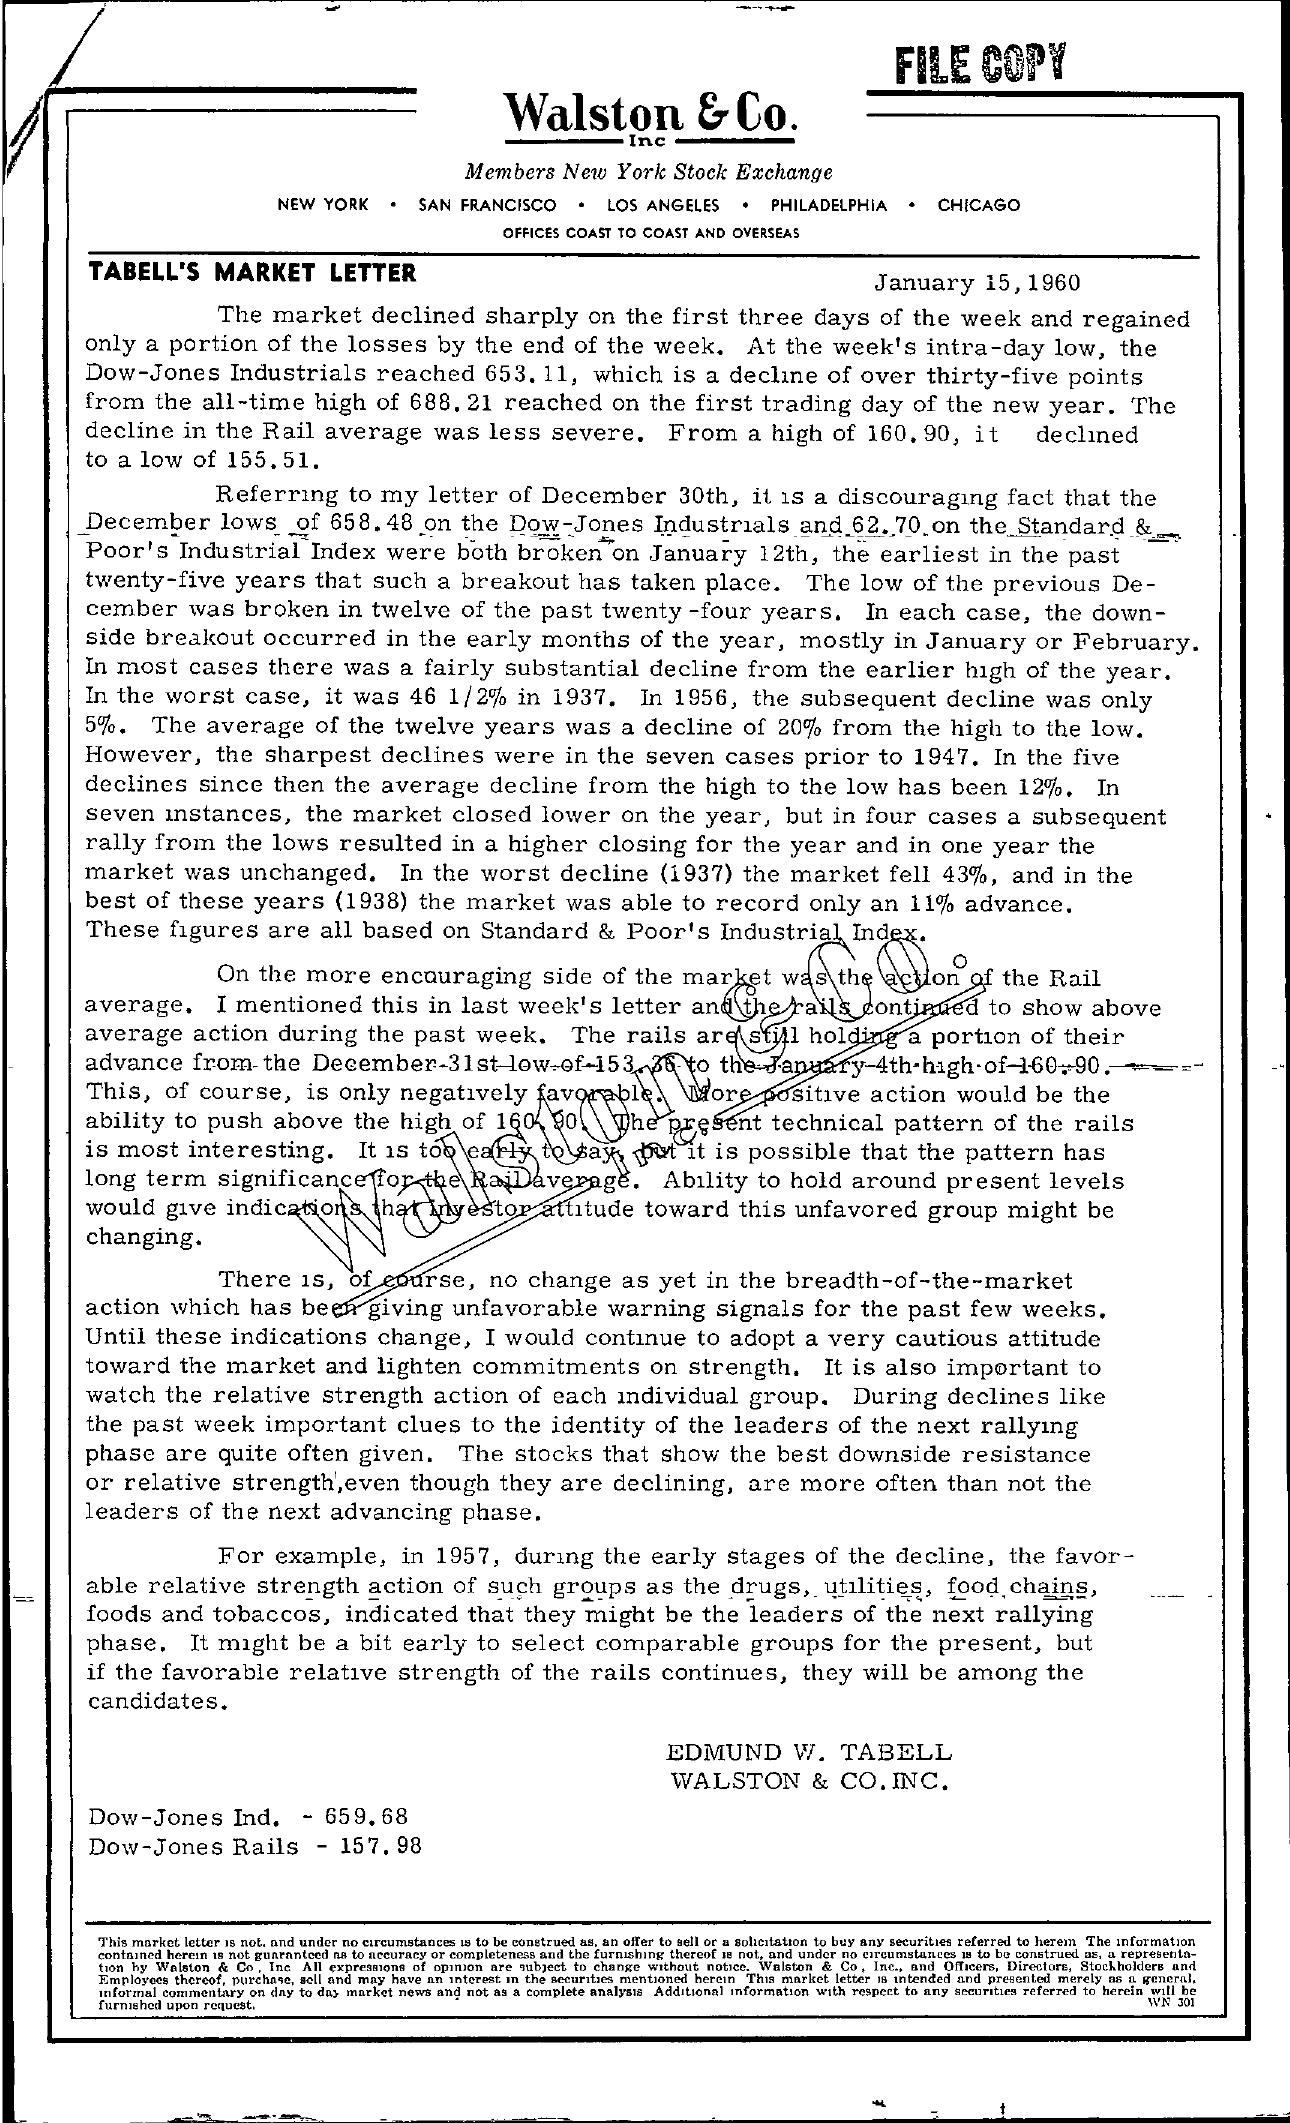 Tabell's Market Letter - January 15, 1960